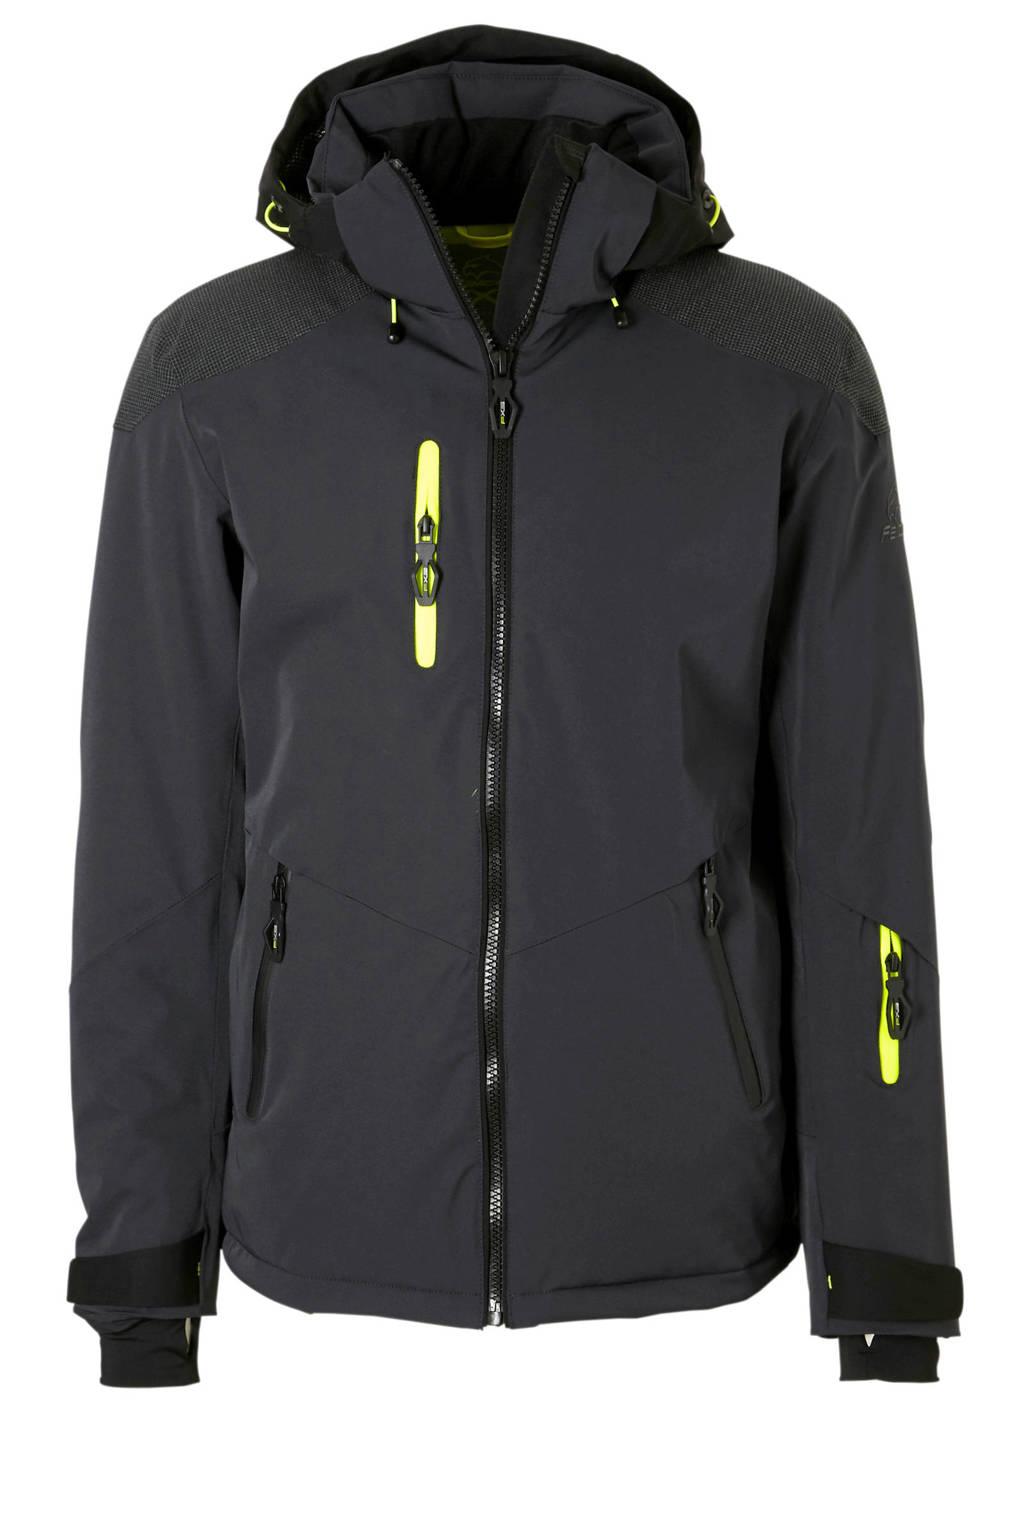 Falcon ski-jack Rafe donkerblauw, Donkerblauw/neon geel